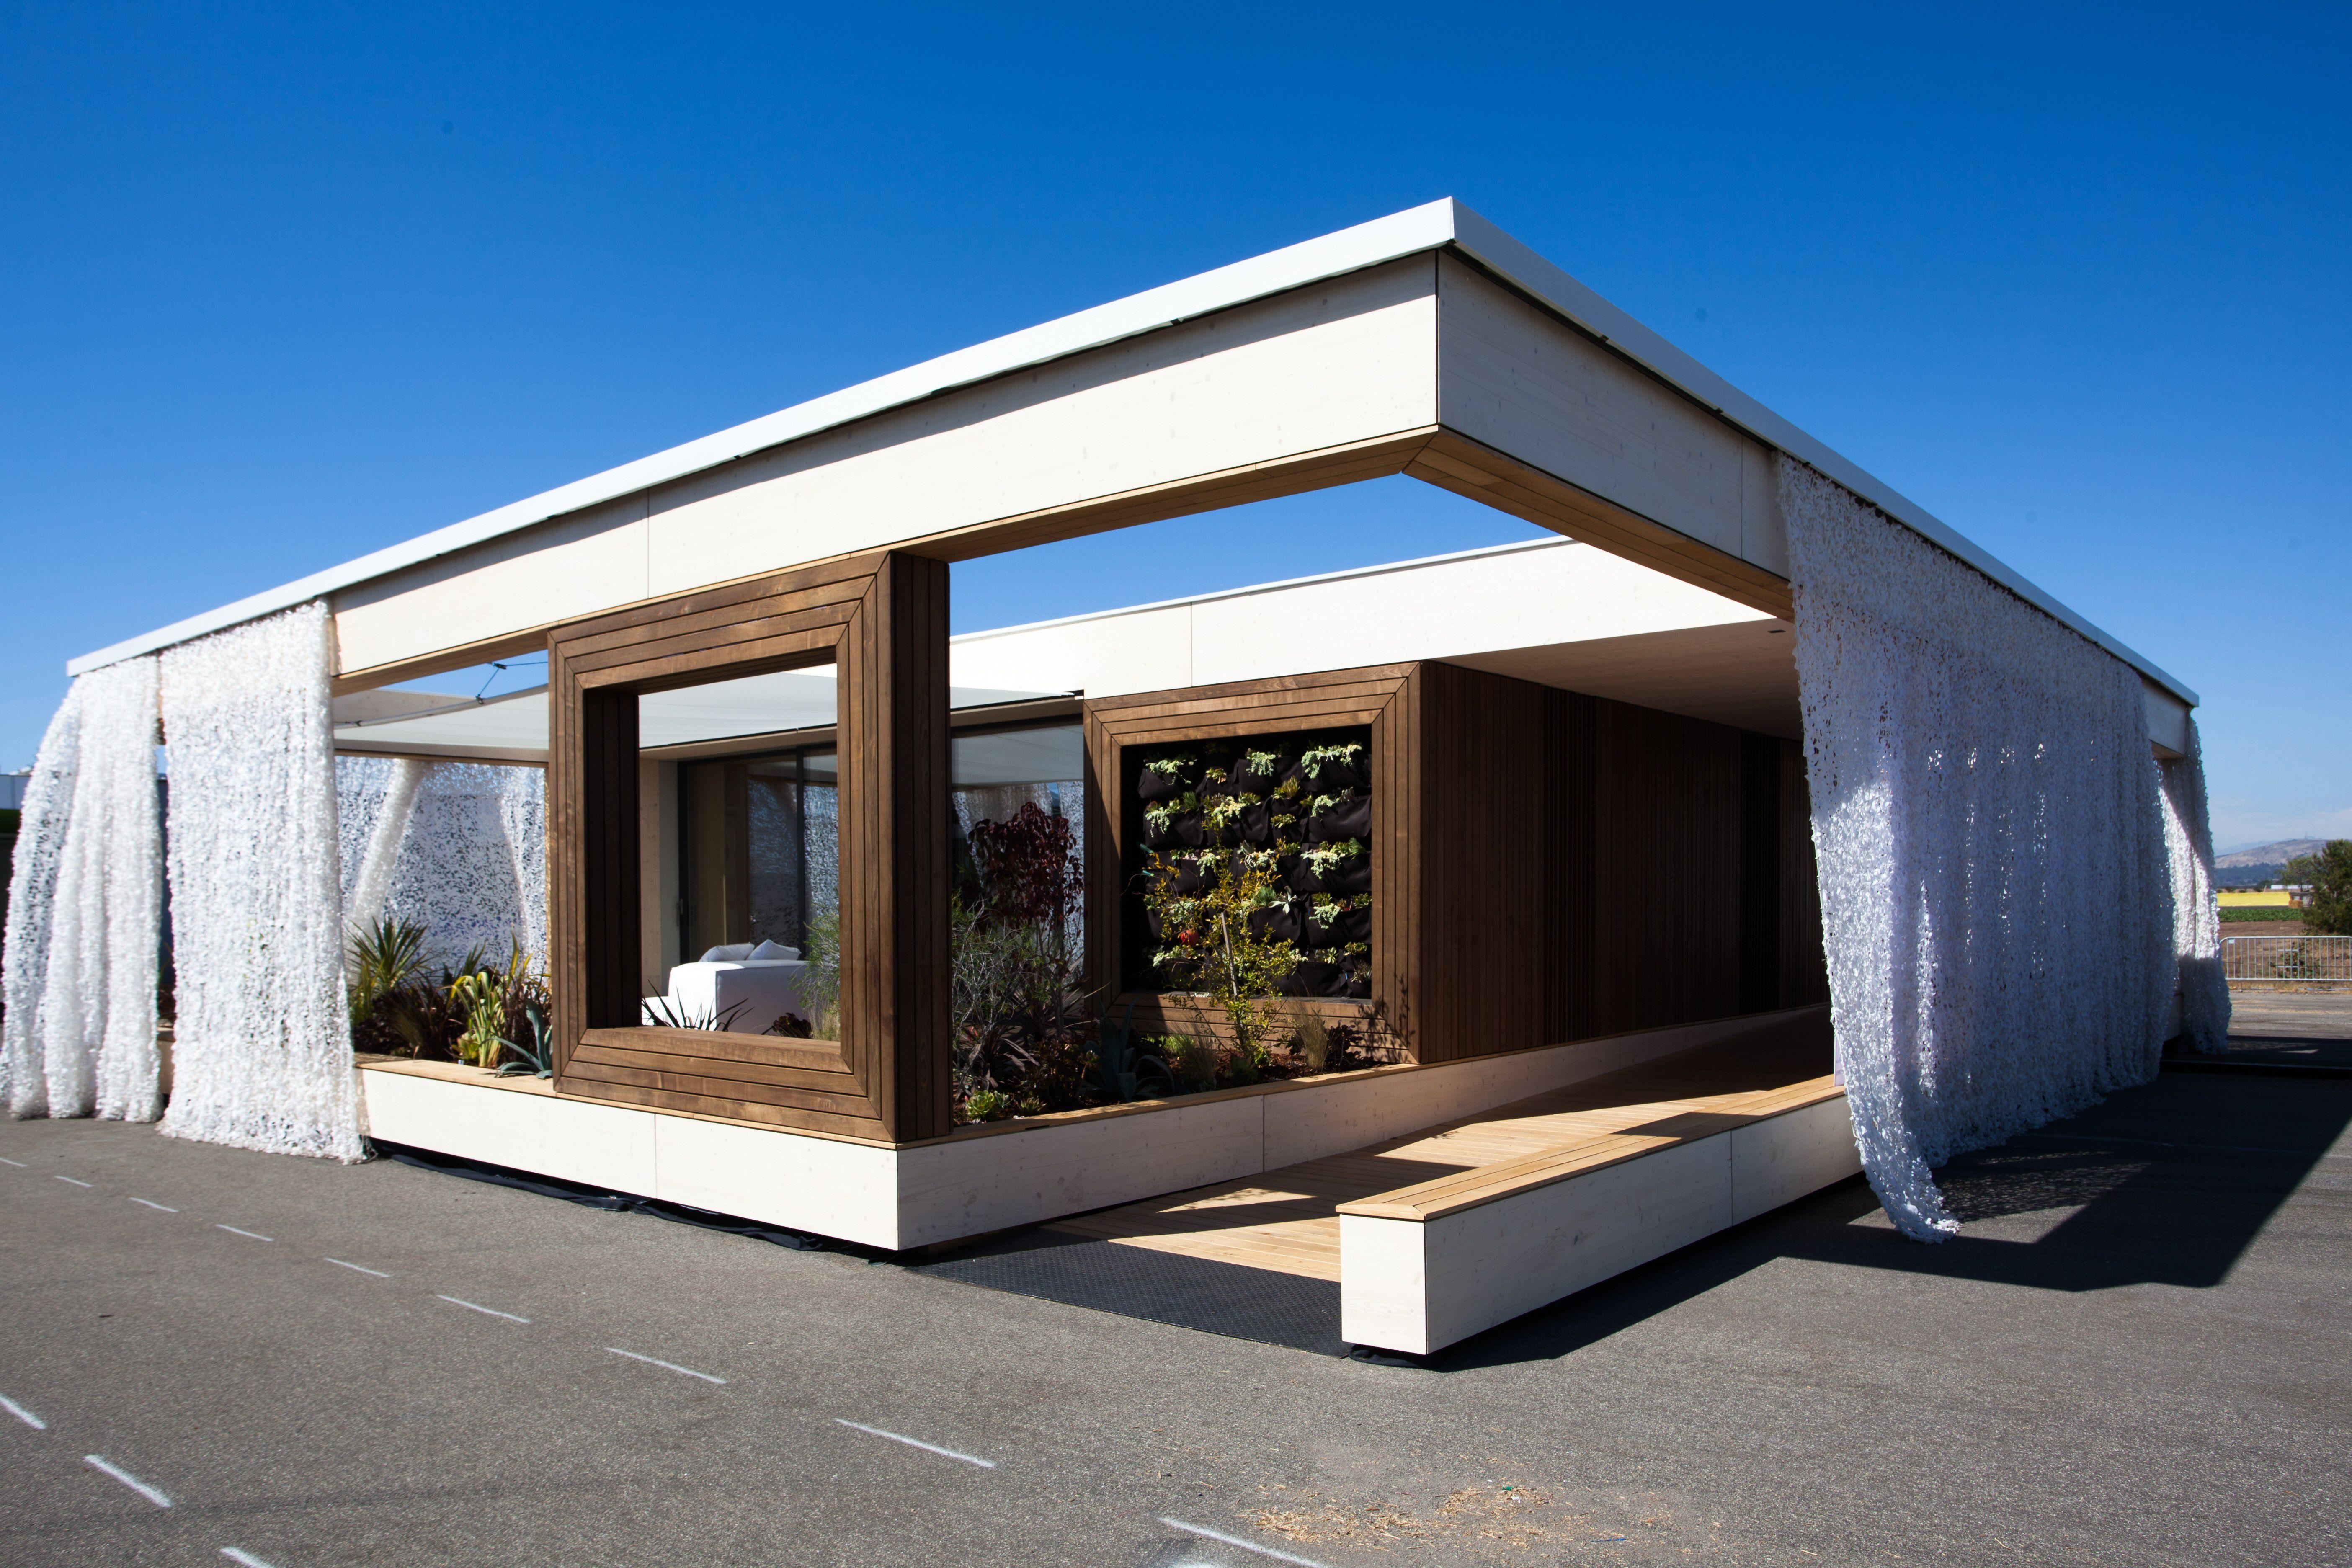 6bf126e16 Winnig Solar Houses at the U.S. Solar Decathlon